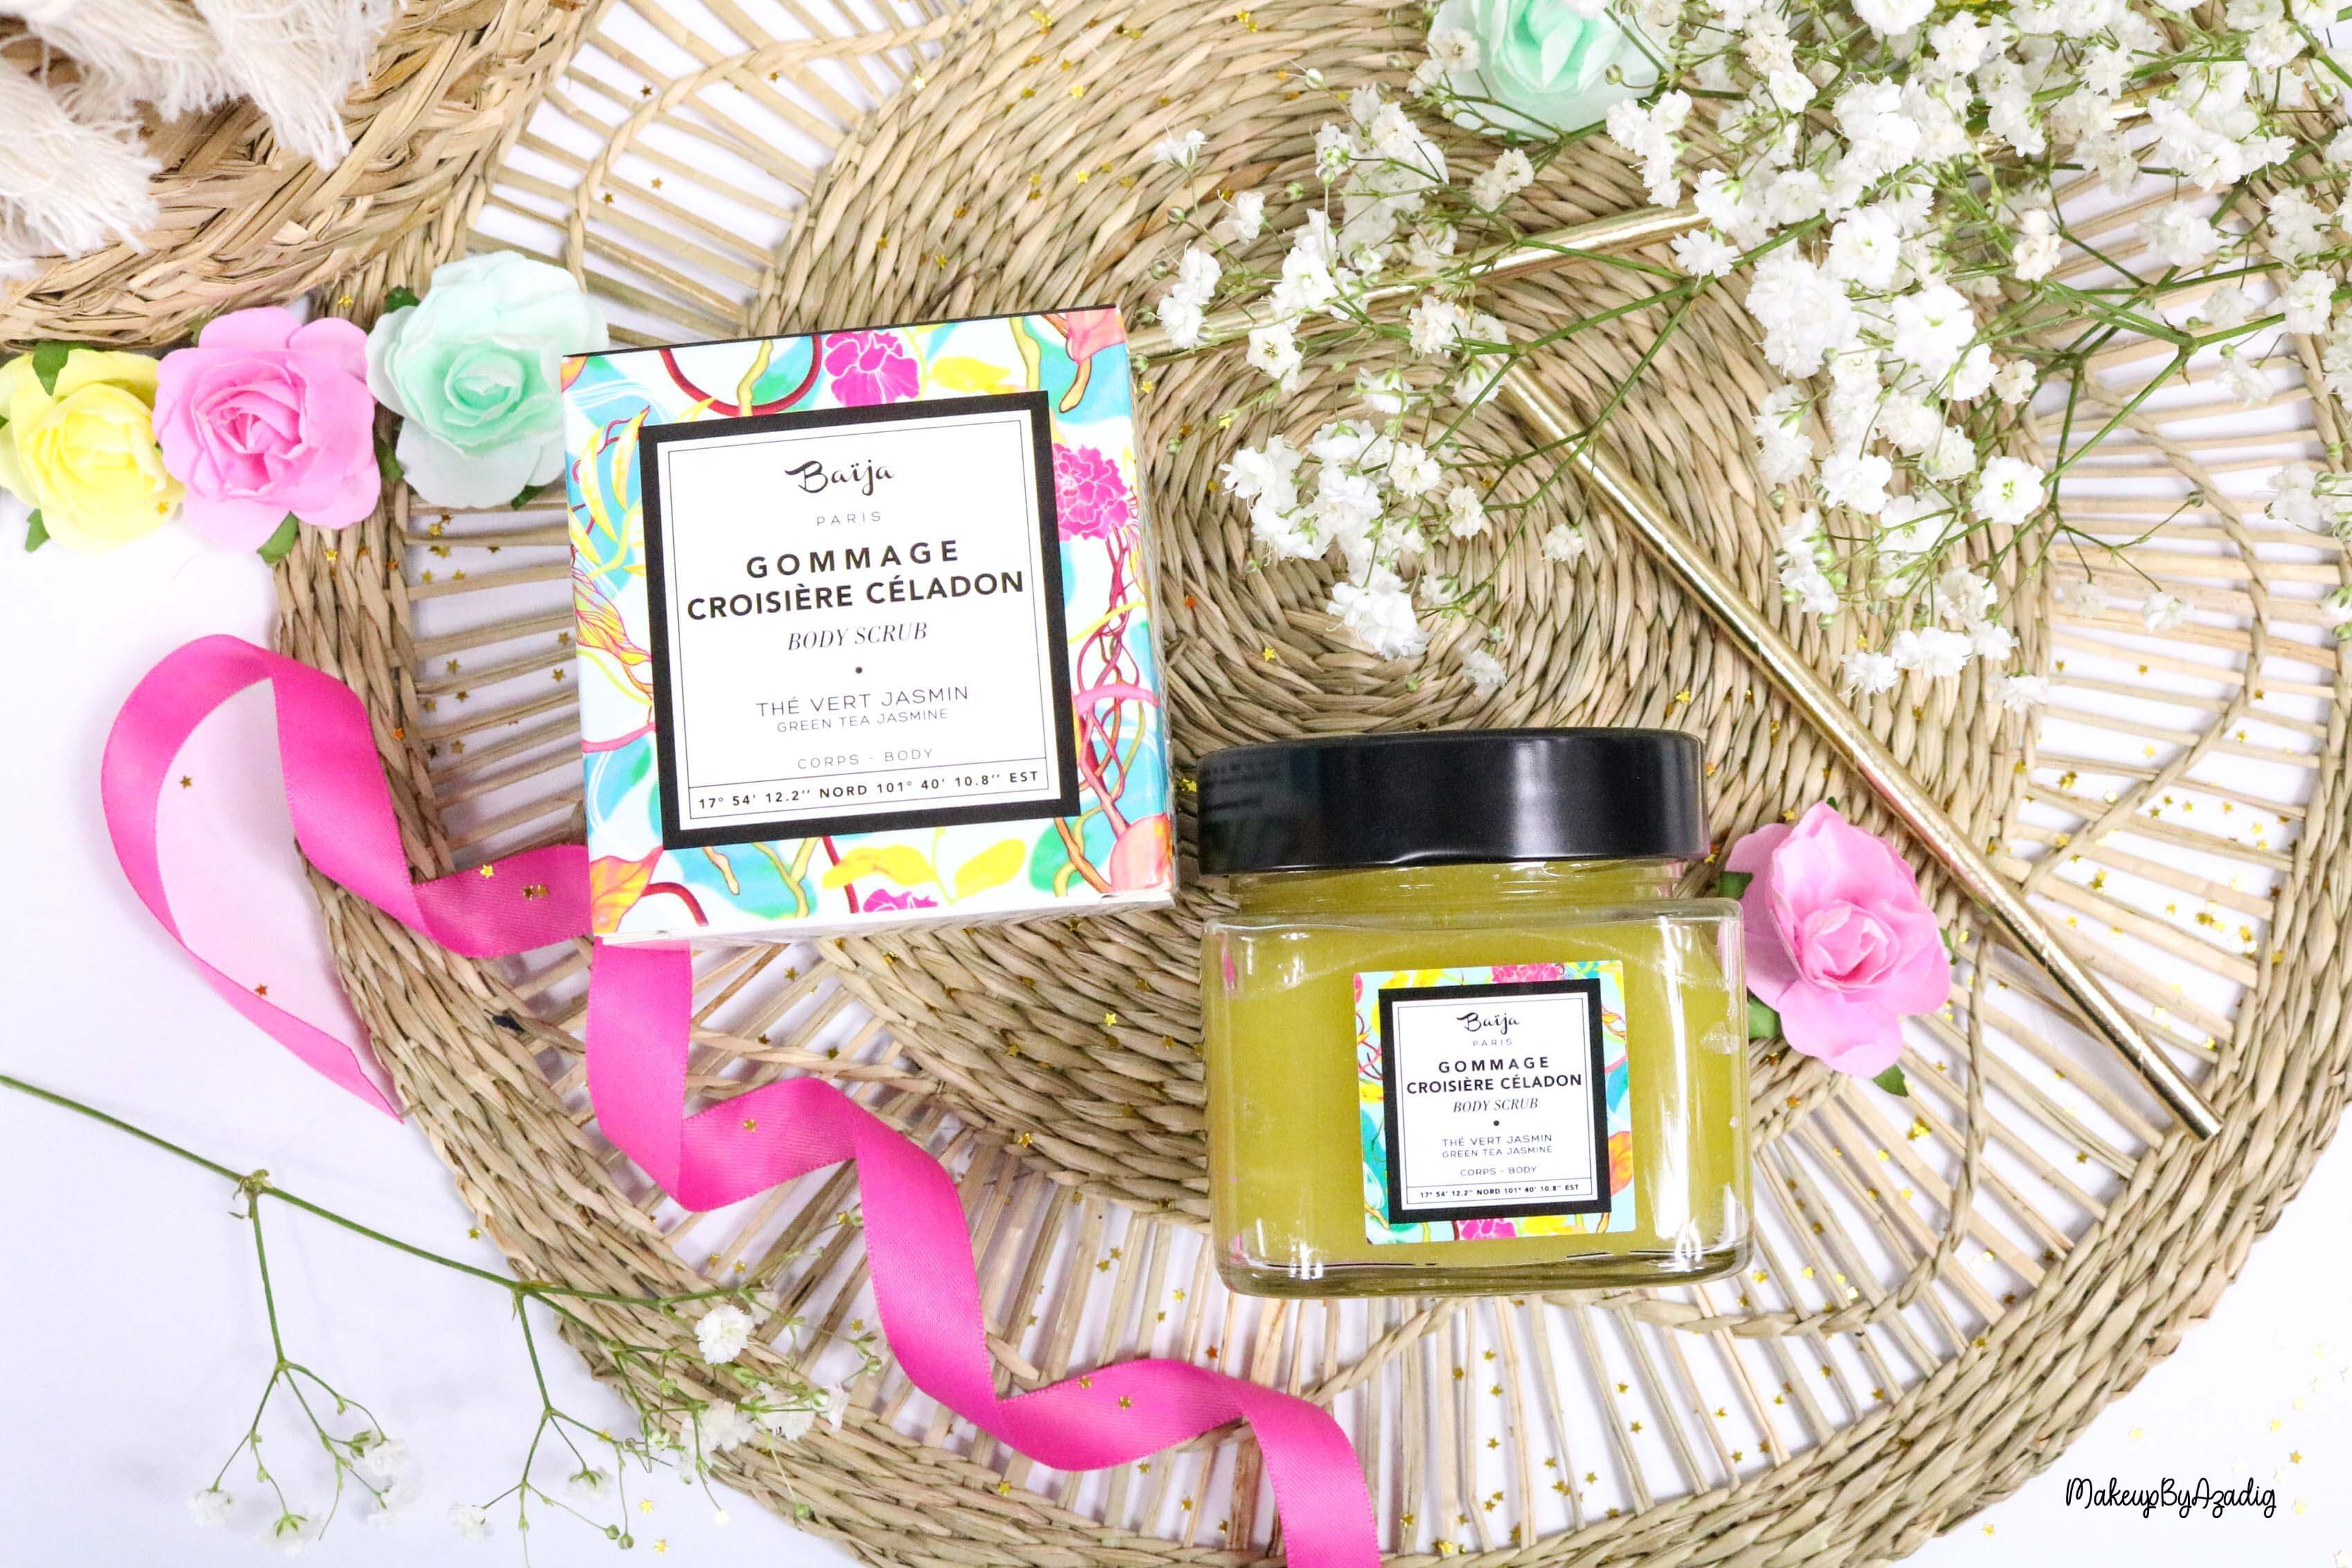 revue-gommage-corps-doux-croisiere-celadon-baija-thevert-jasmin-sephora-avis-prix-madeinfrance-makeupbyazadig-exfoliant